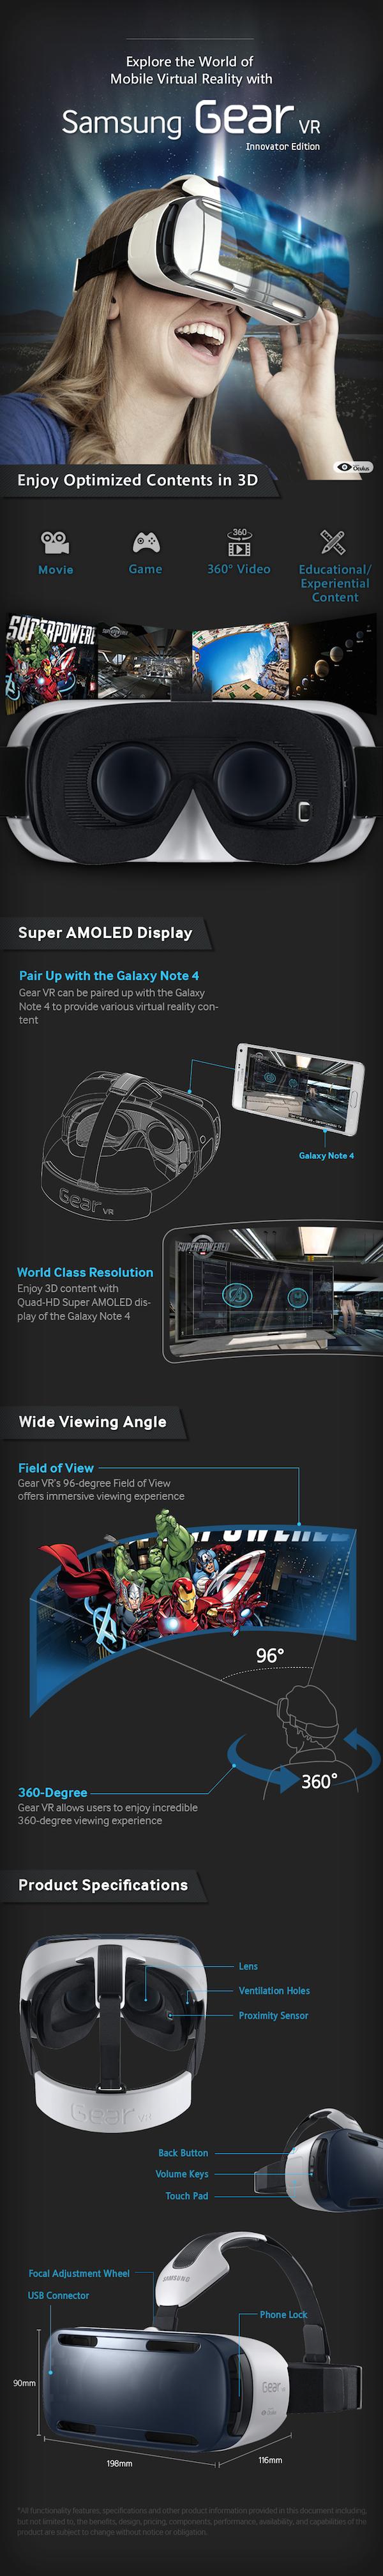 Возможности Samsung Gear VR